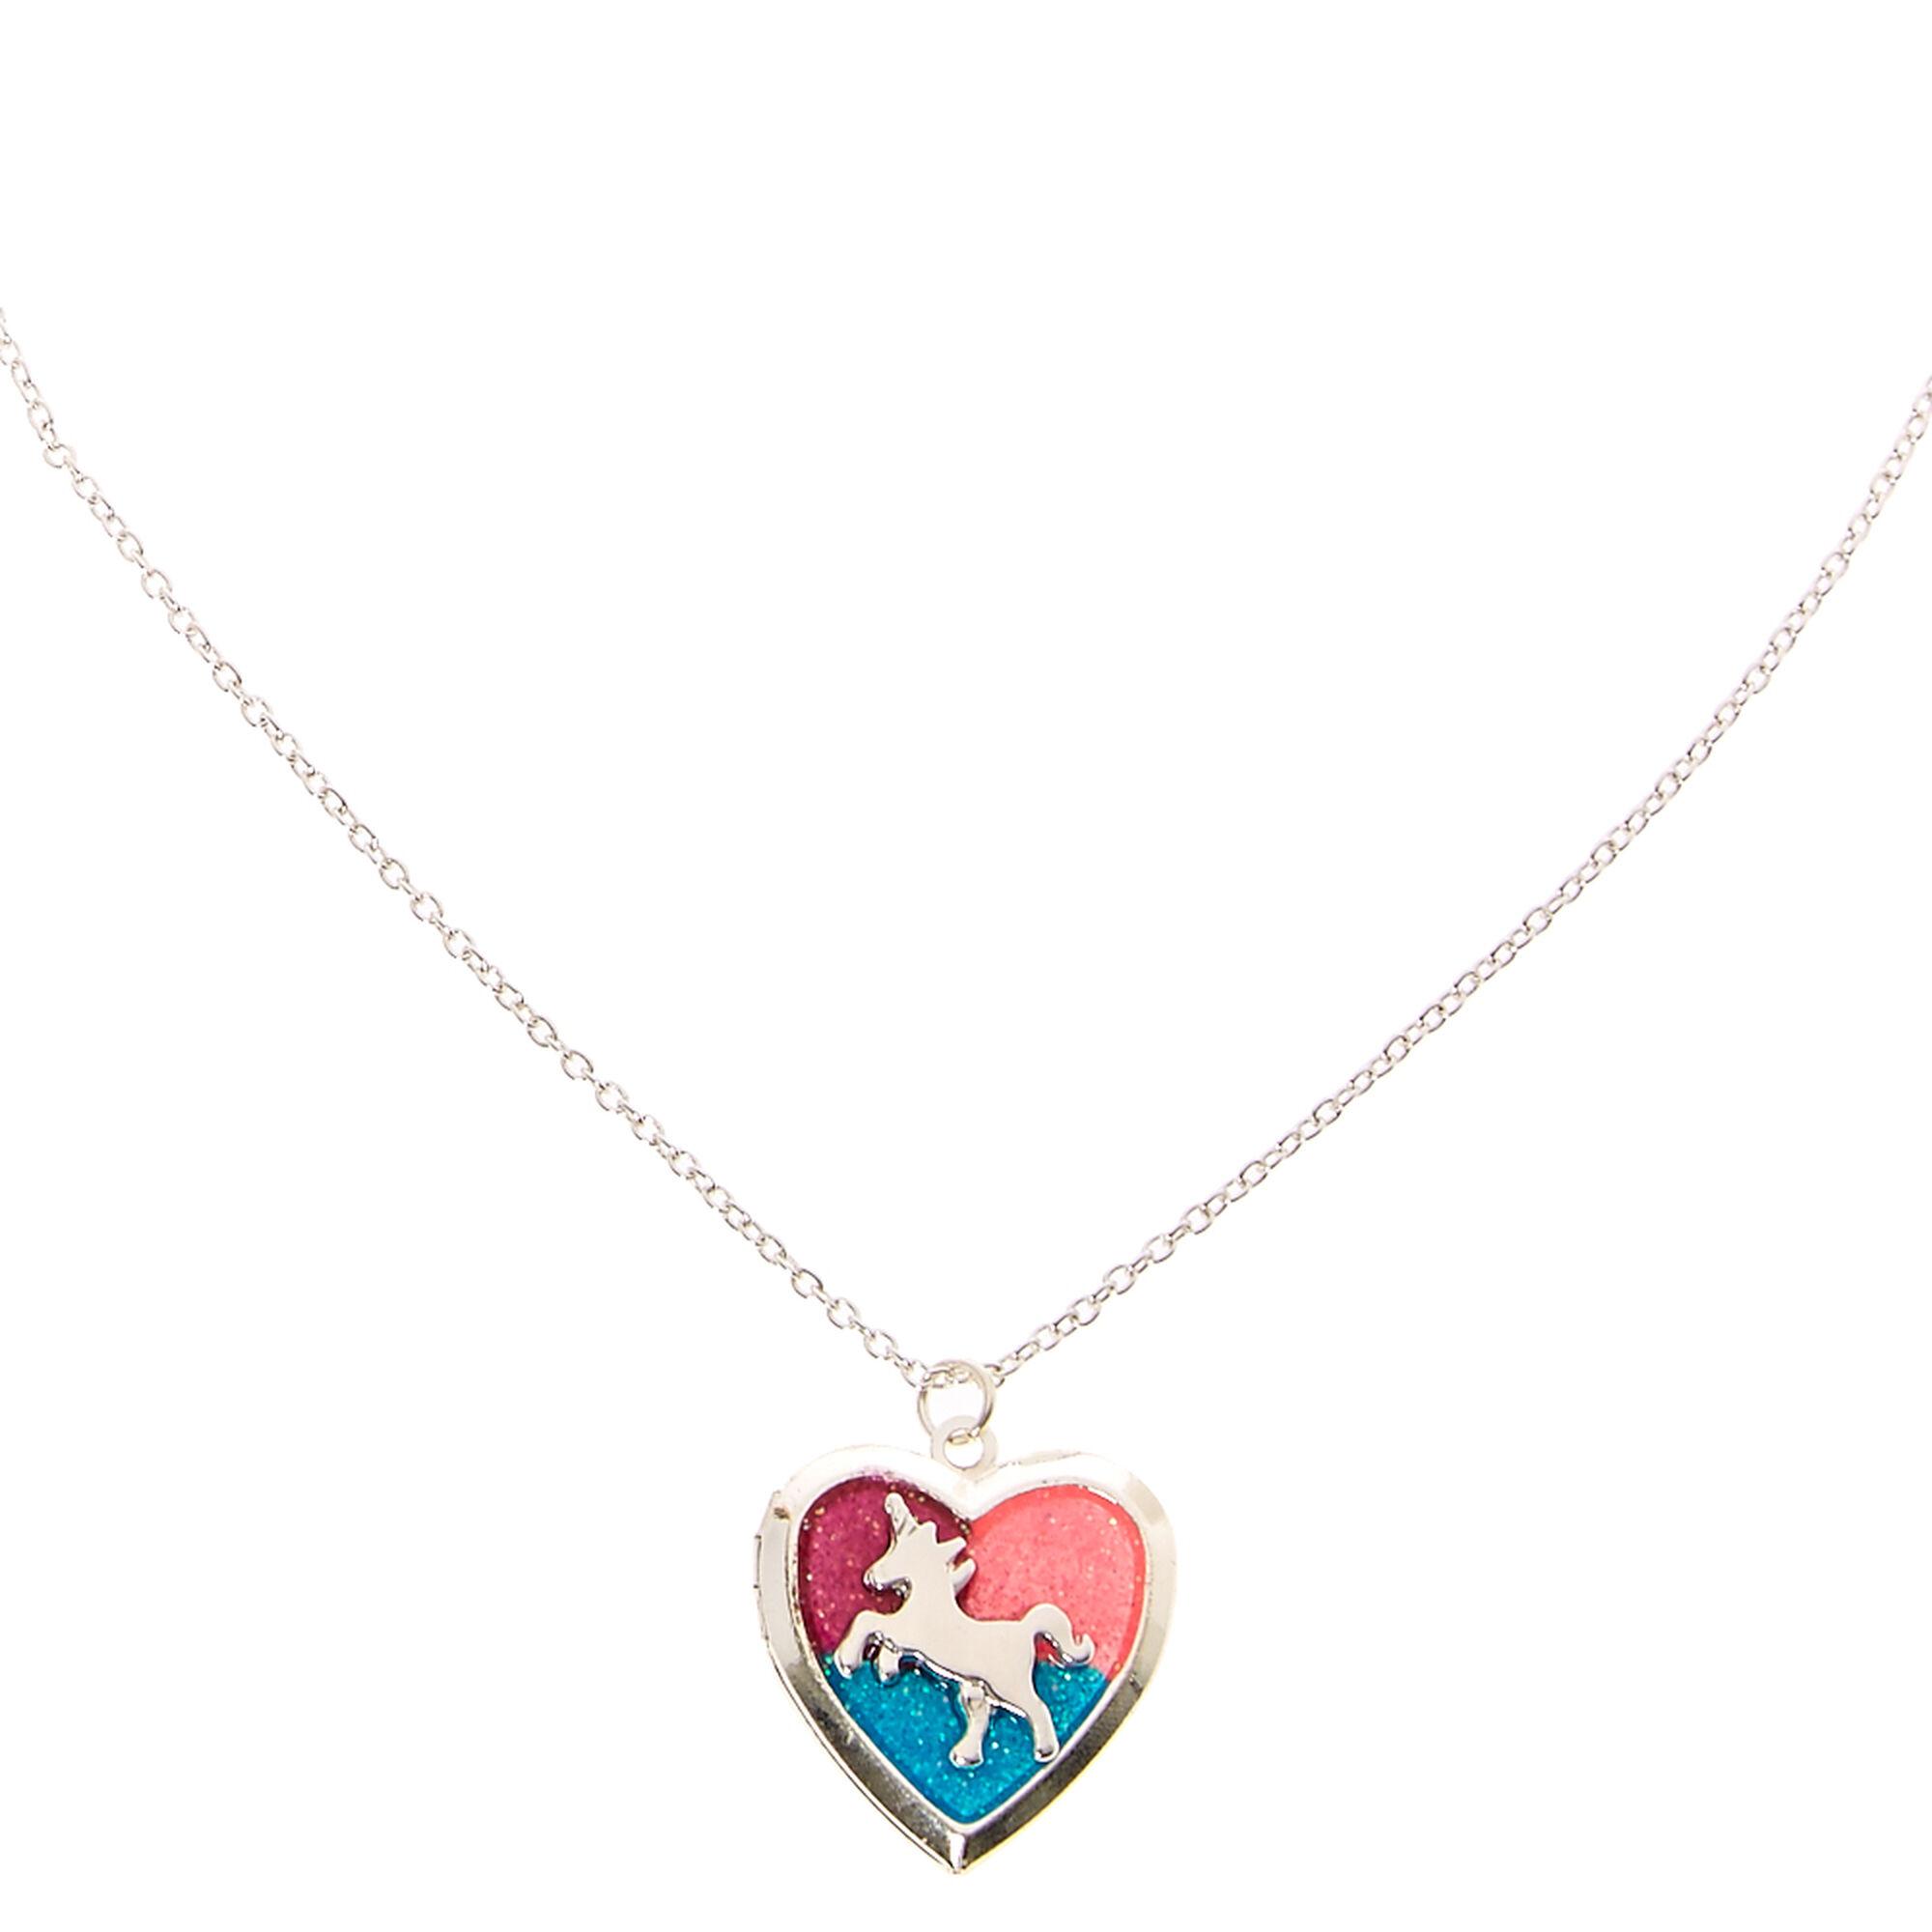 Glitter unicorn heart locket silver tone necklace claires us glitter unicorn heart locket silver tone necklace aloadofball Choice Image